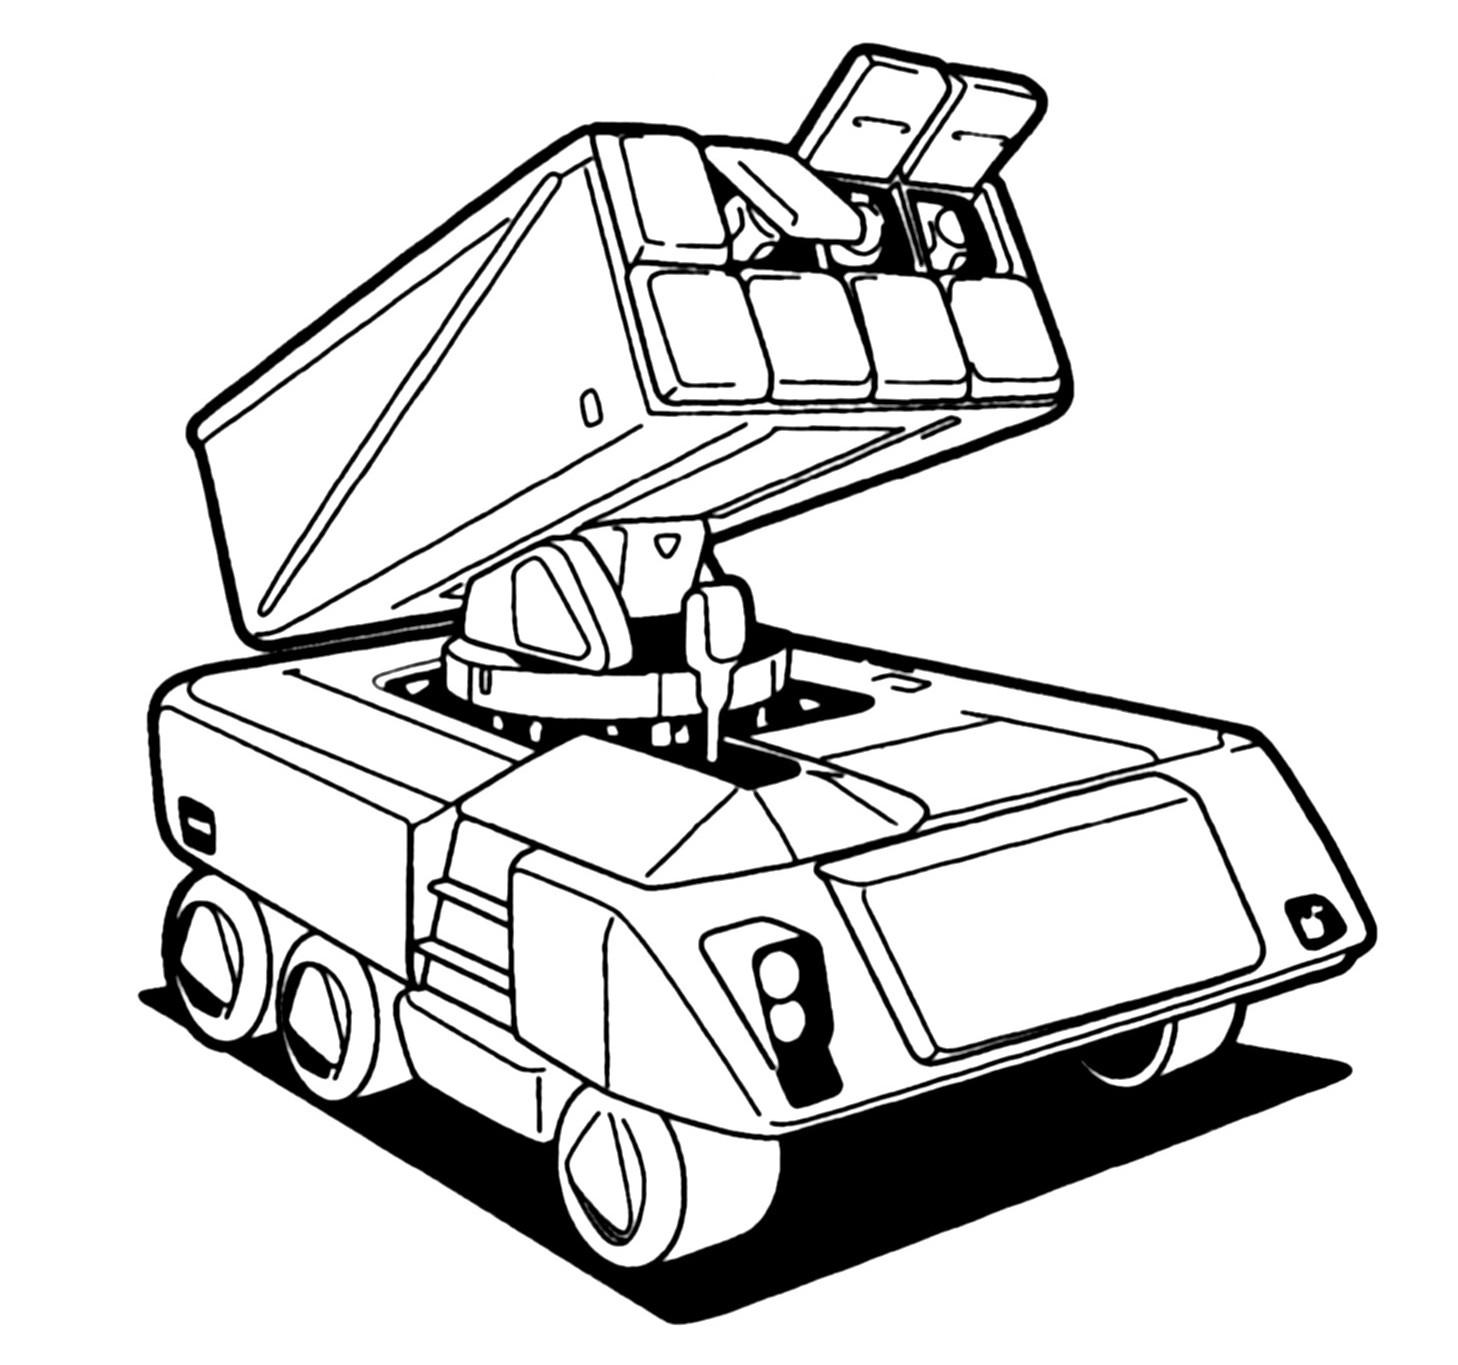 Oerlikon Contraves M 400 Arbalist Missile System